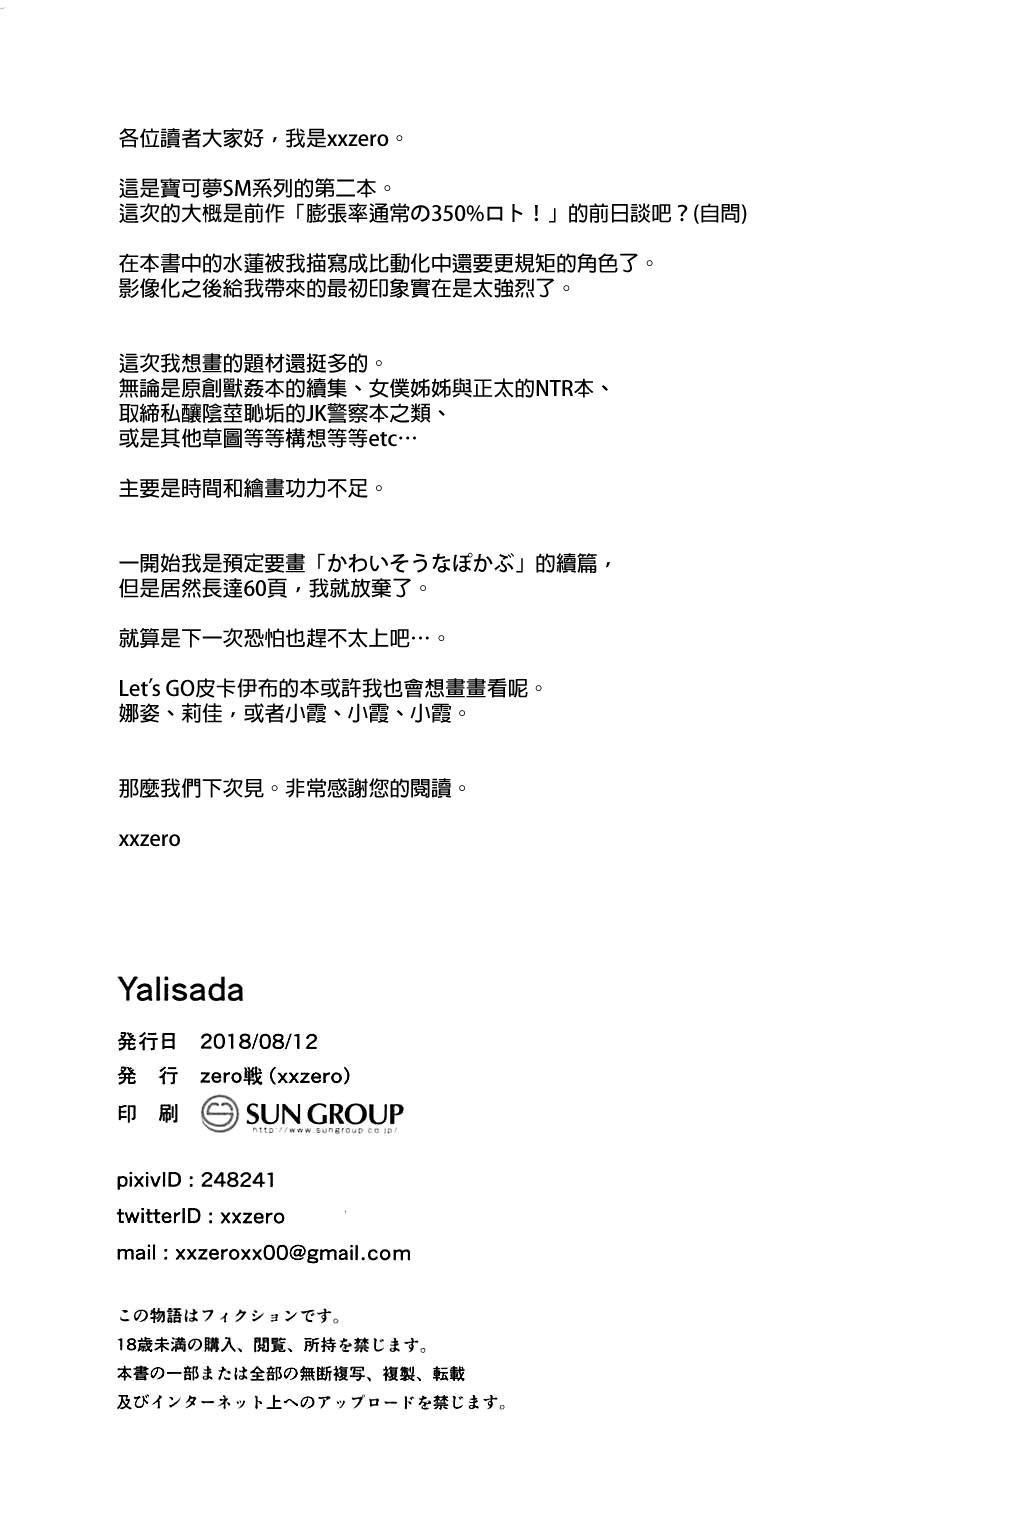 (C94) [zero-sen (xxzero)] Yalisada Fellasada Hen (Pokémon Sun and Moon)) [Chinese] [final個人漢化] 19